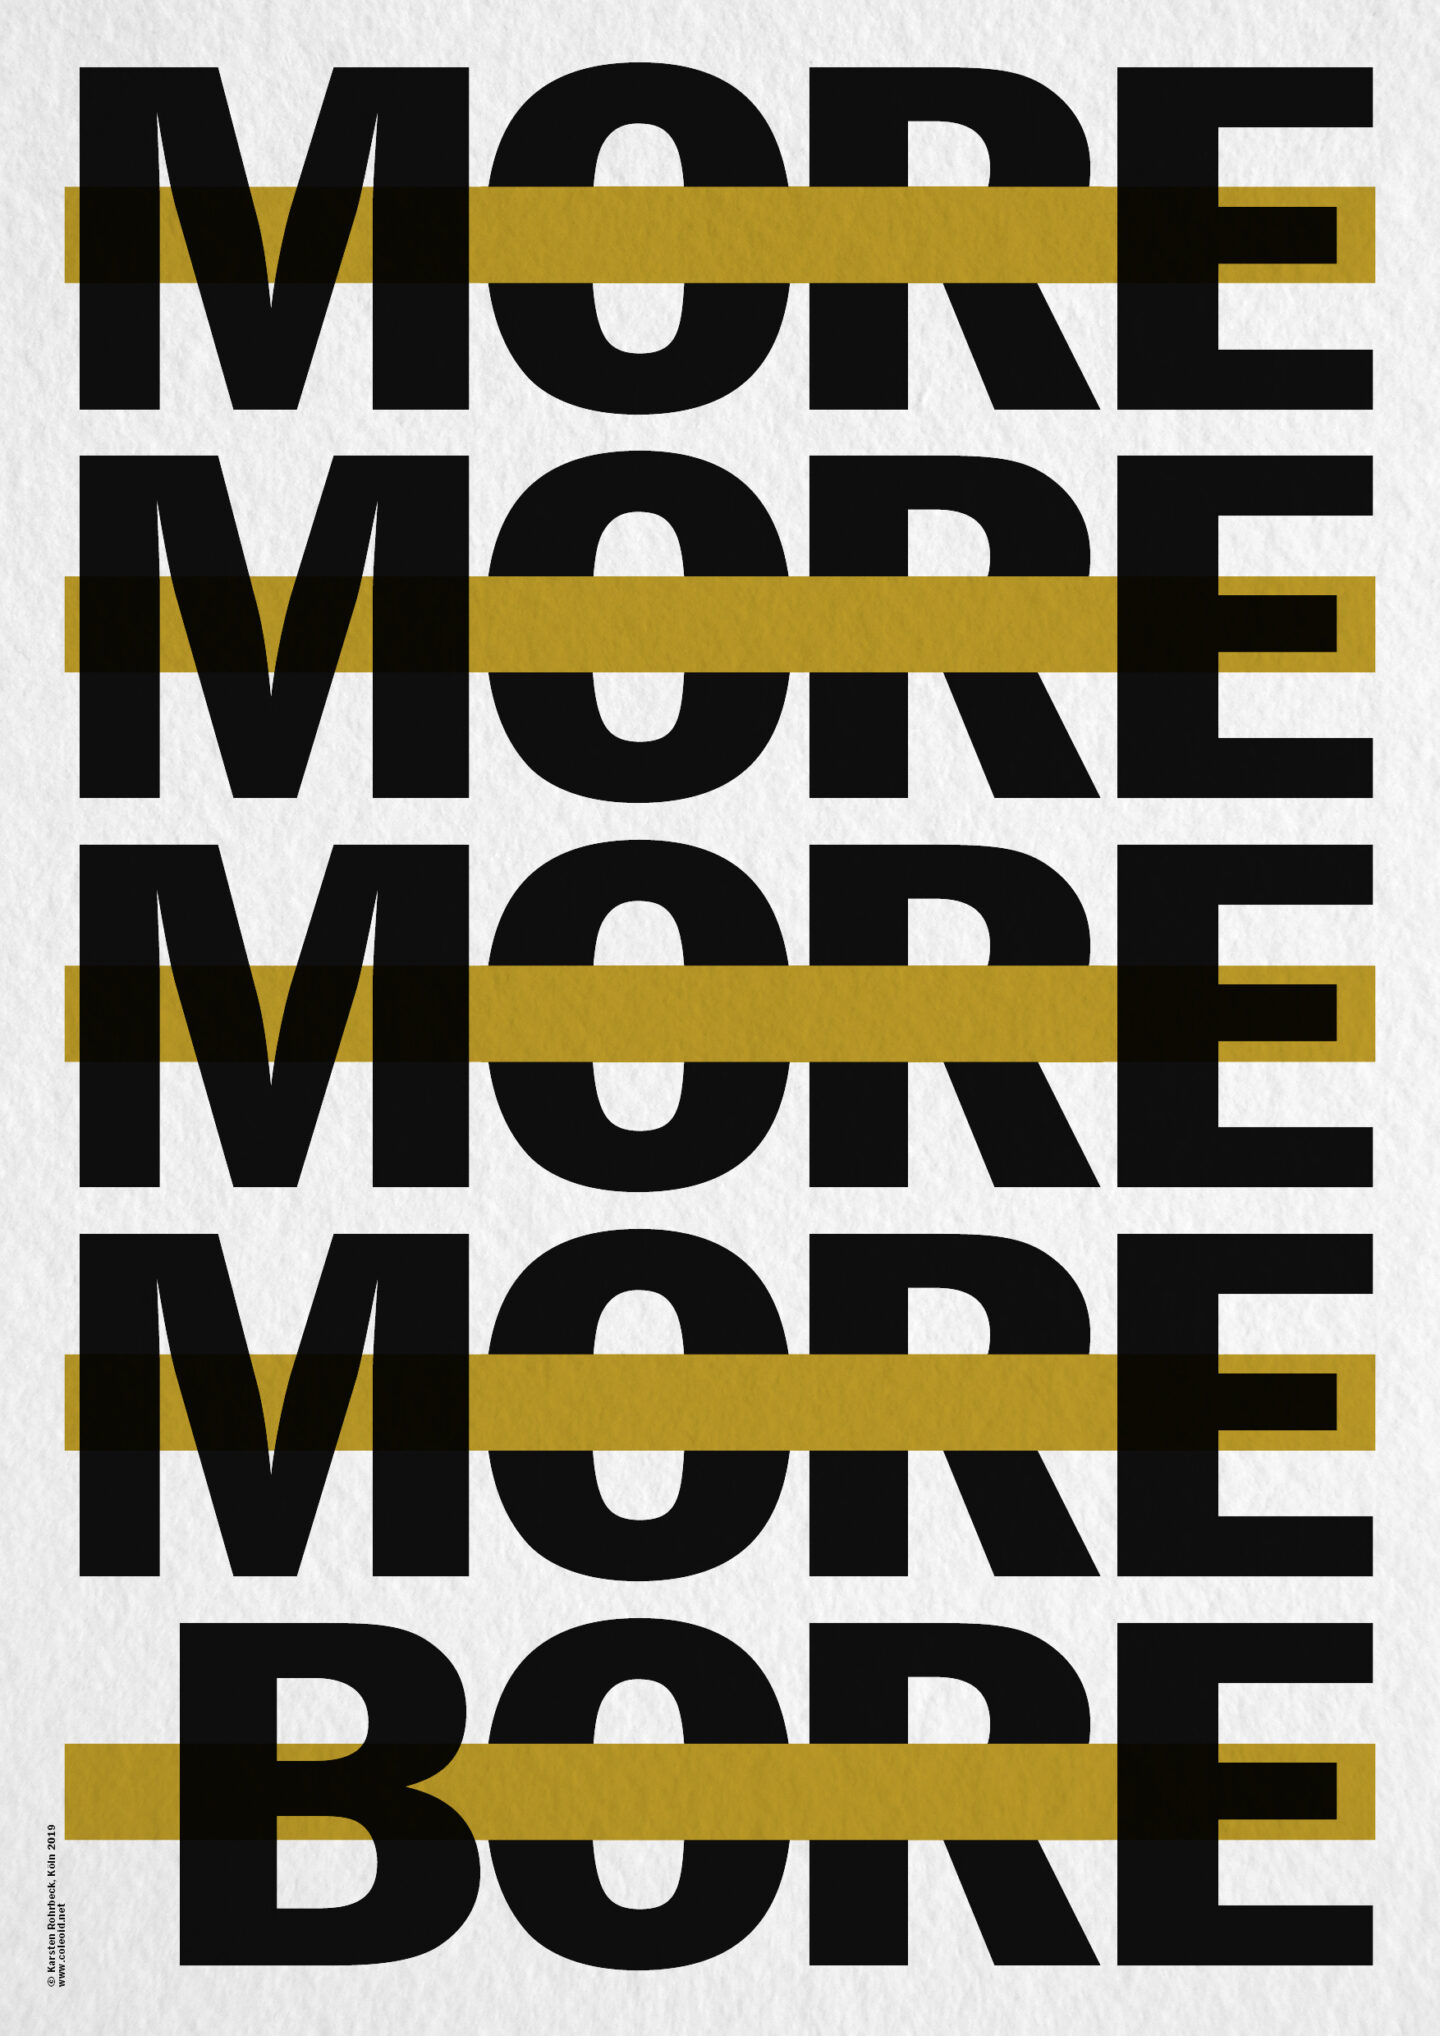 Karsten Rohrbeck: More More More Bore Poster